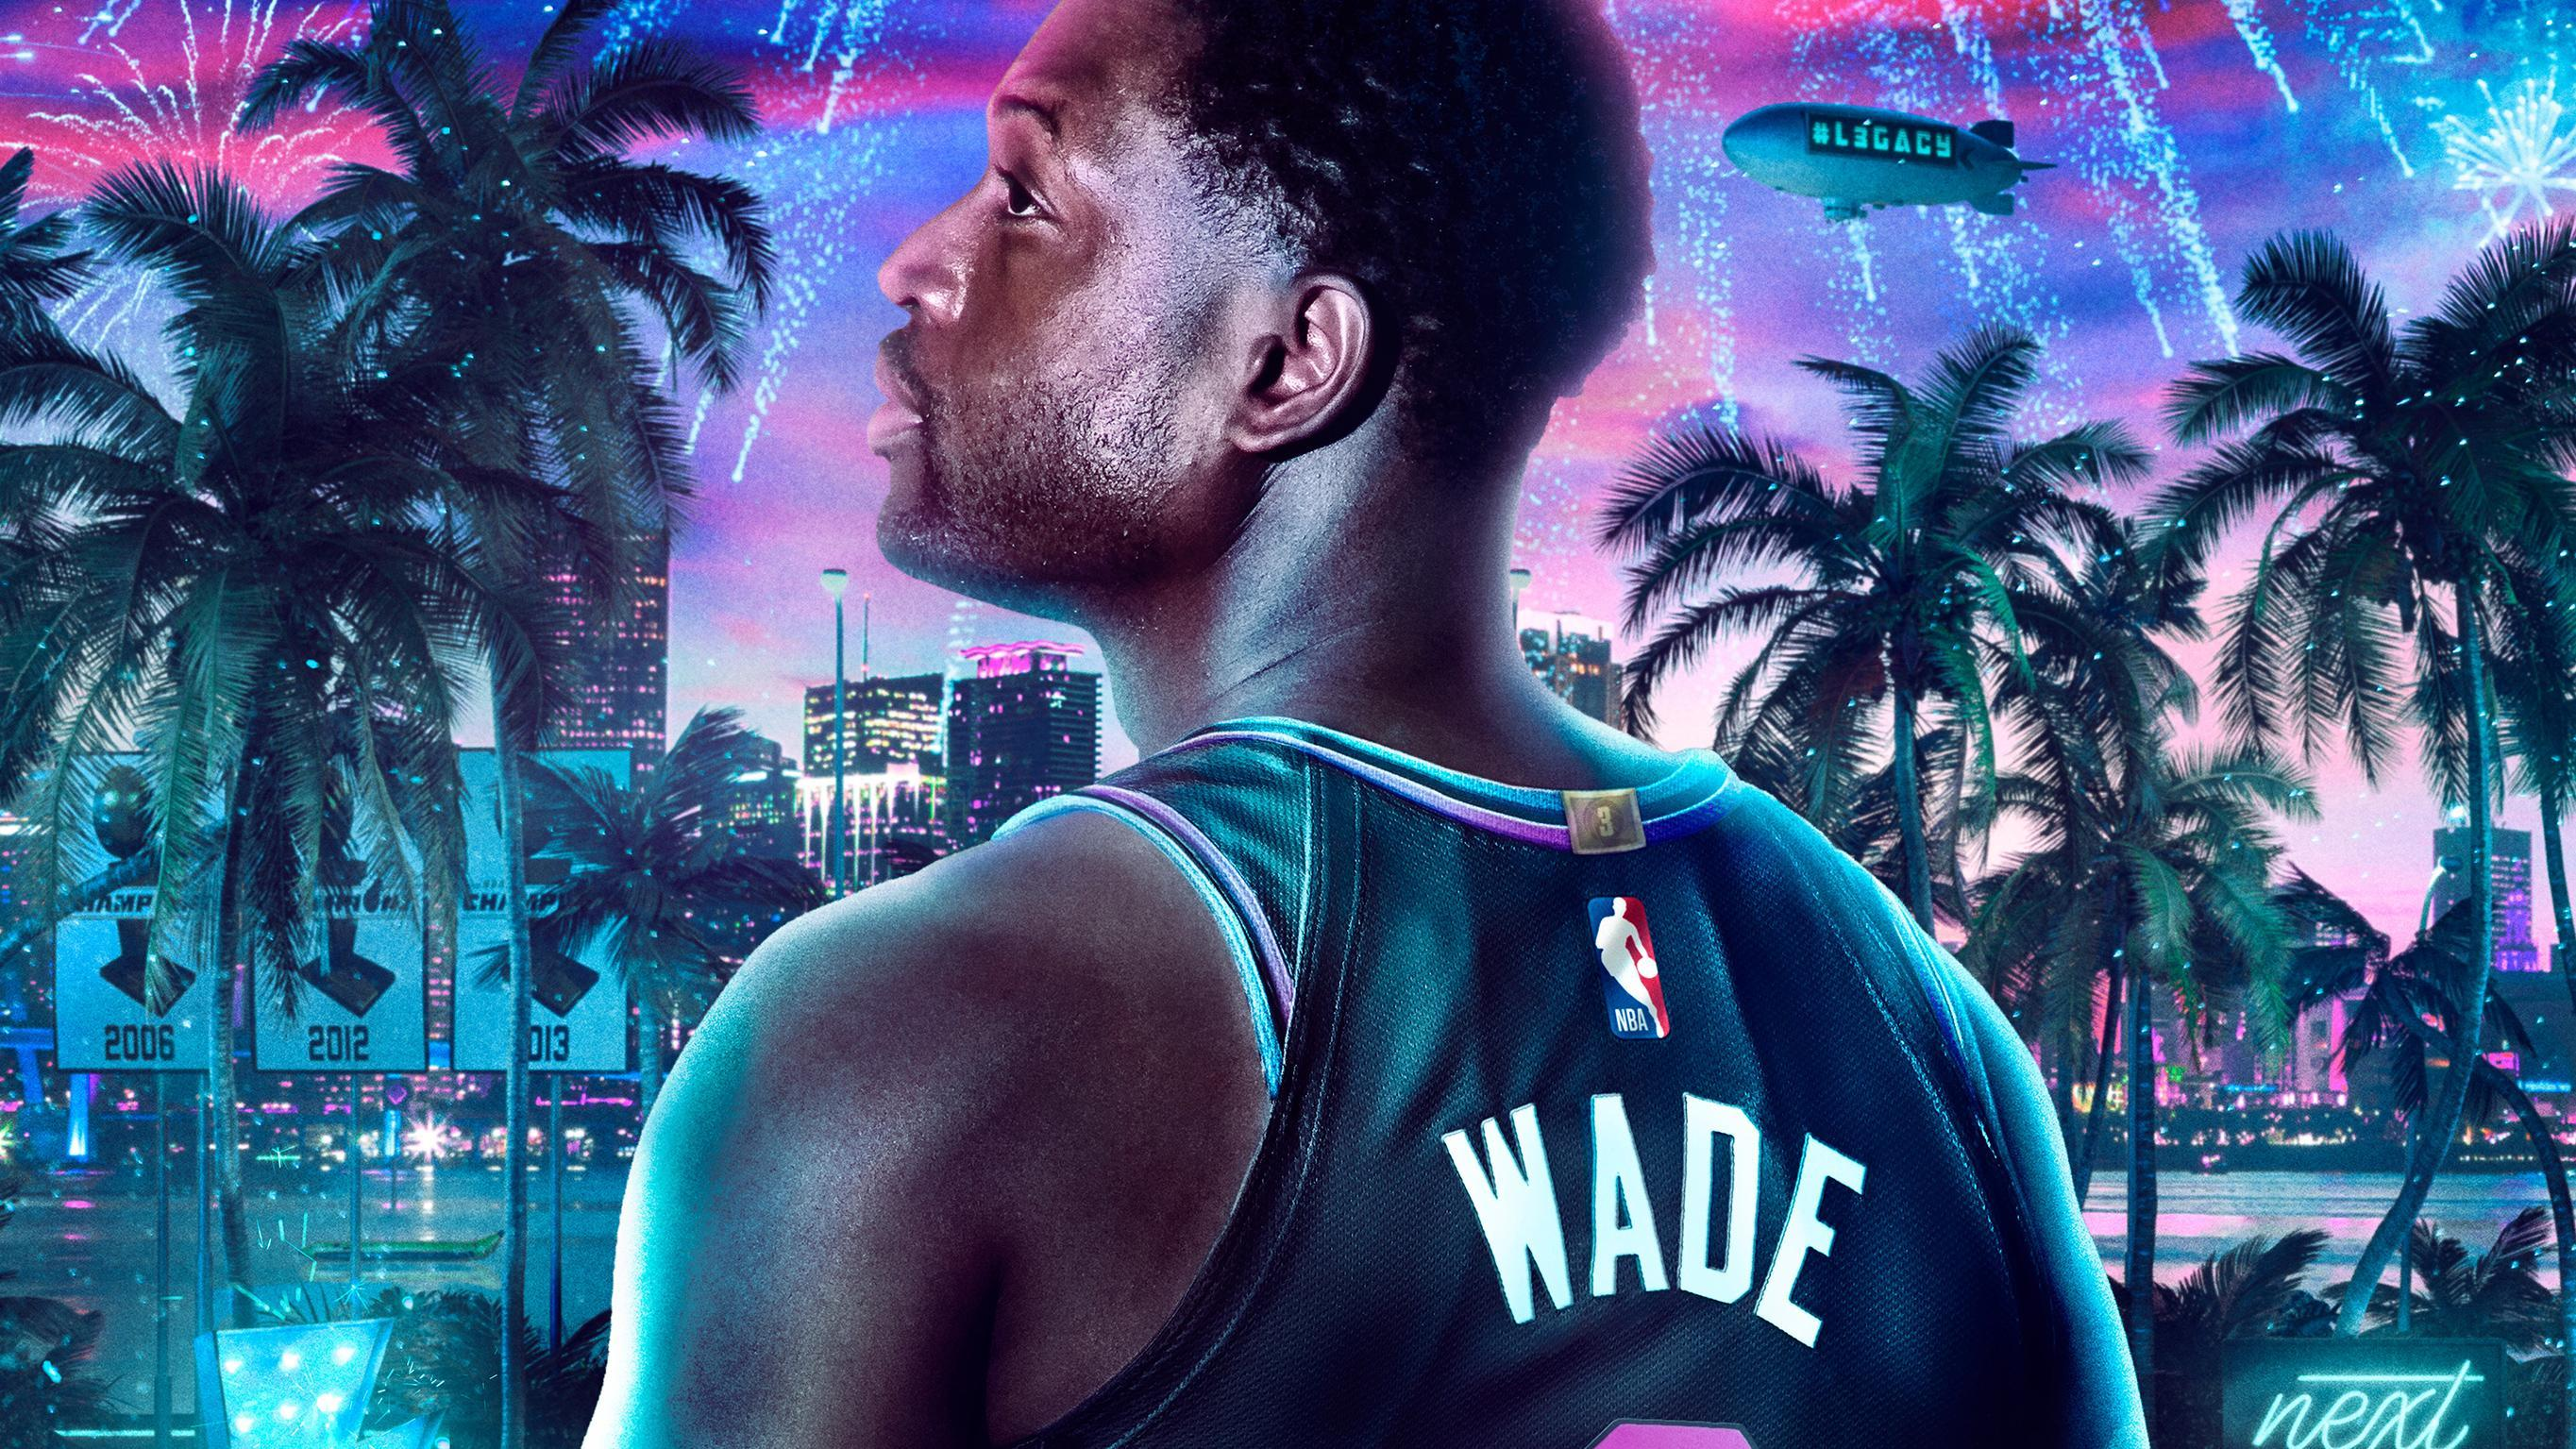 NBA 2K20 HD Wallpapers 2729x1535